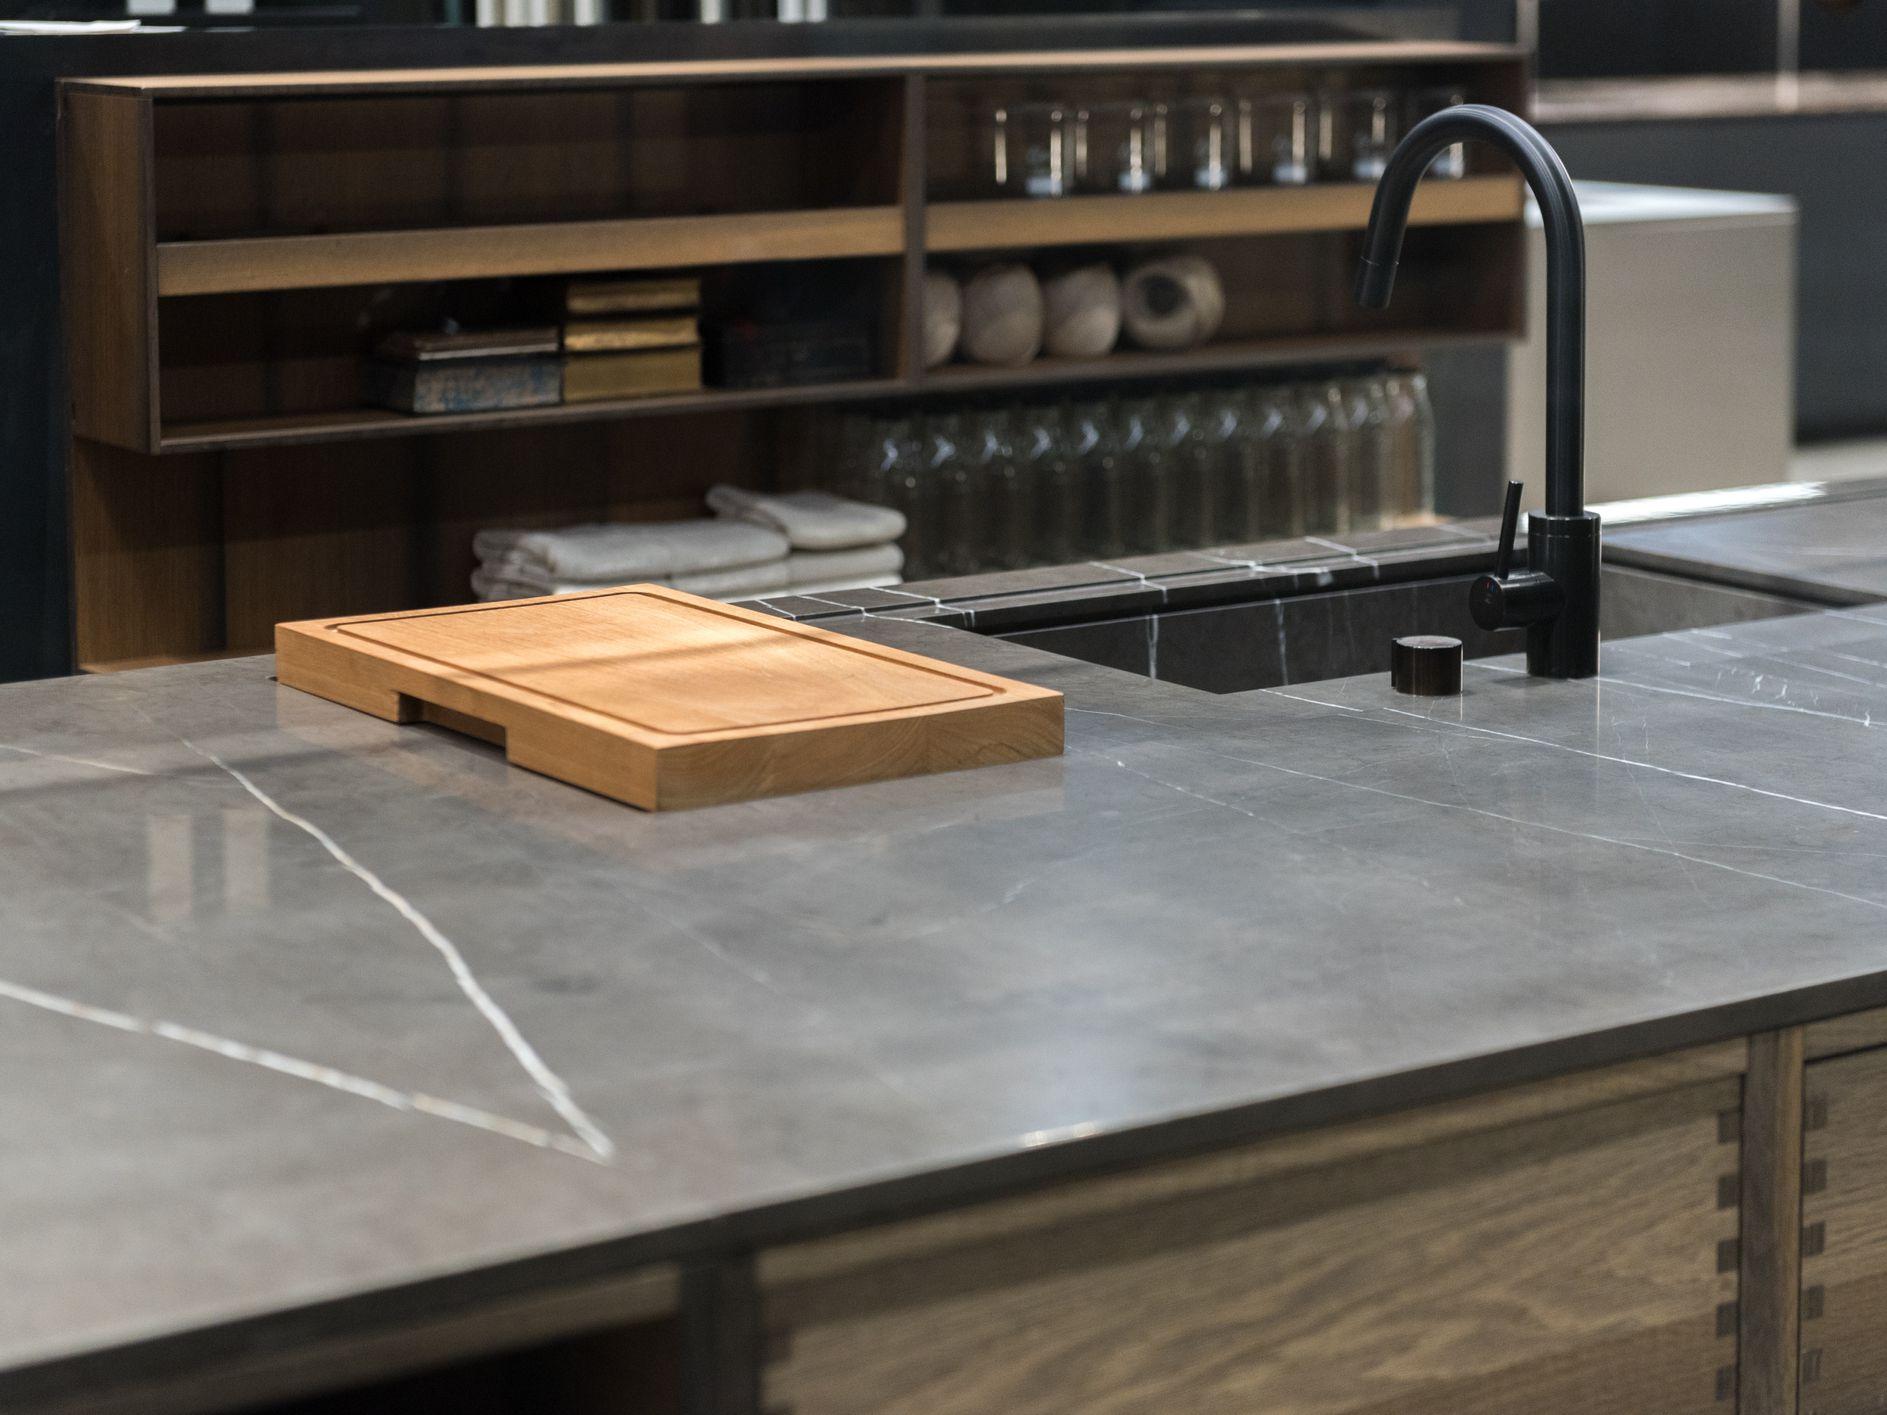 Soapstone For Kitchen Countertops